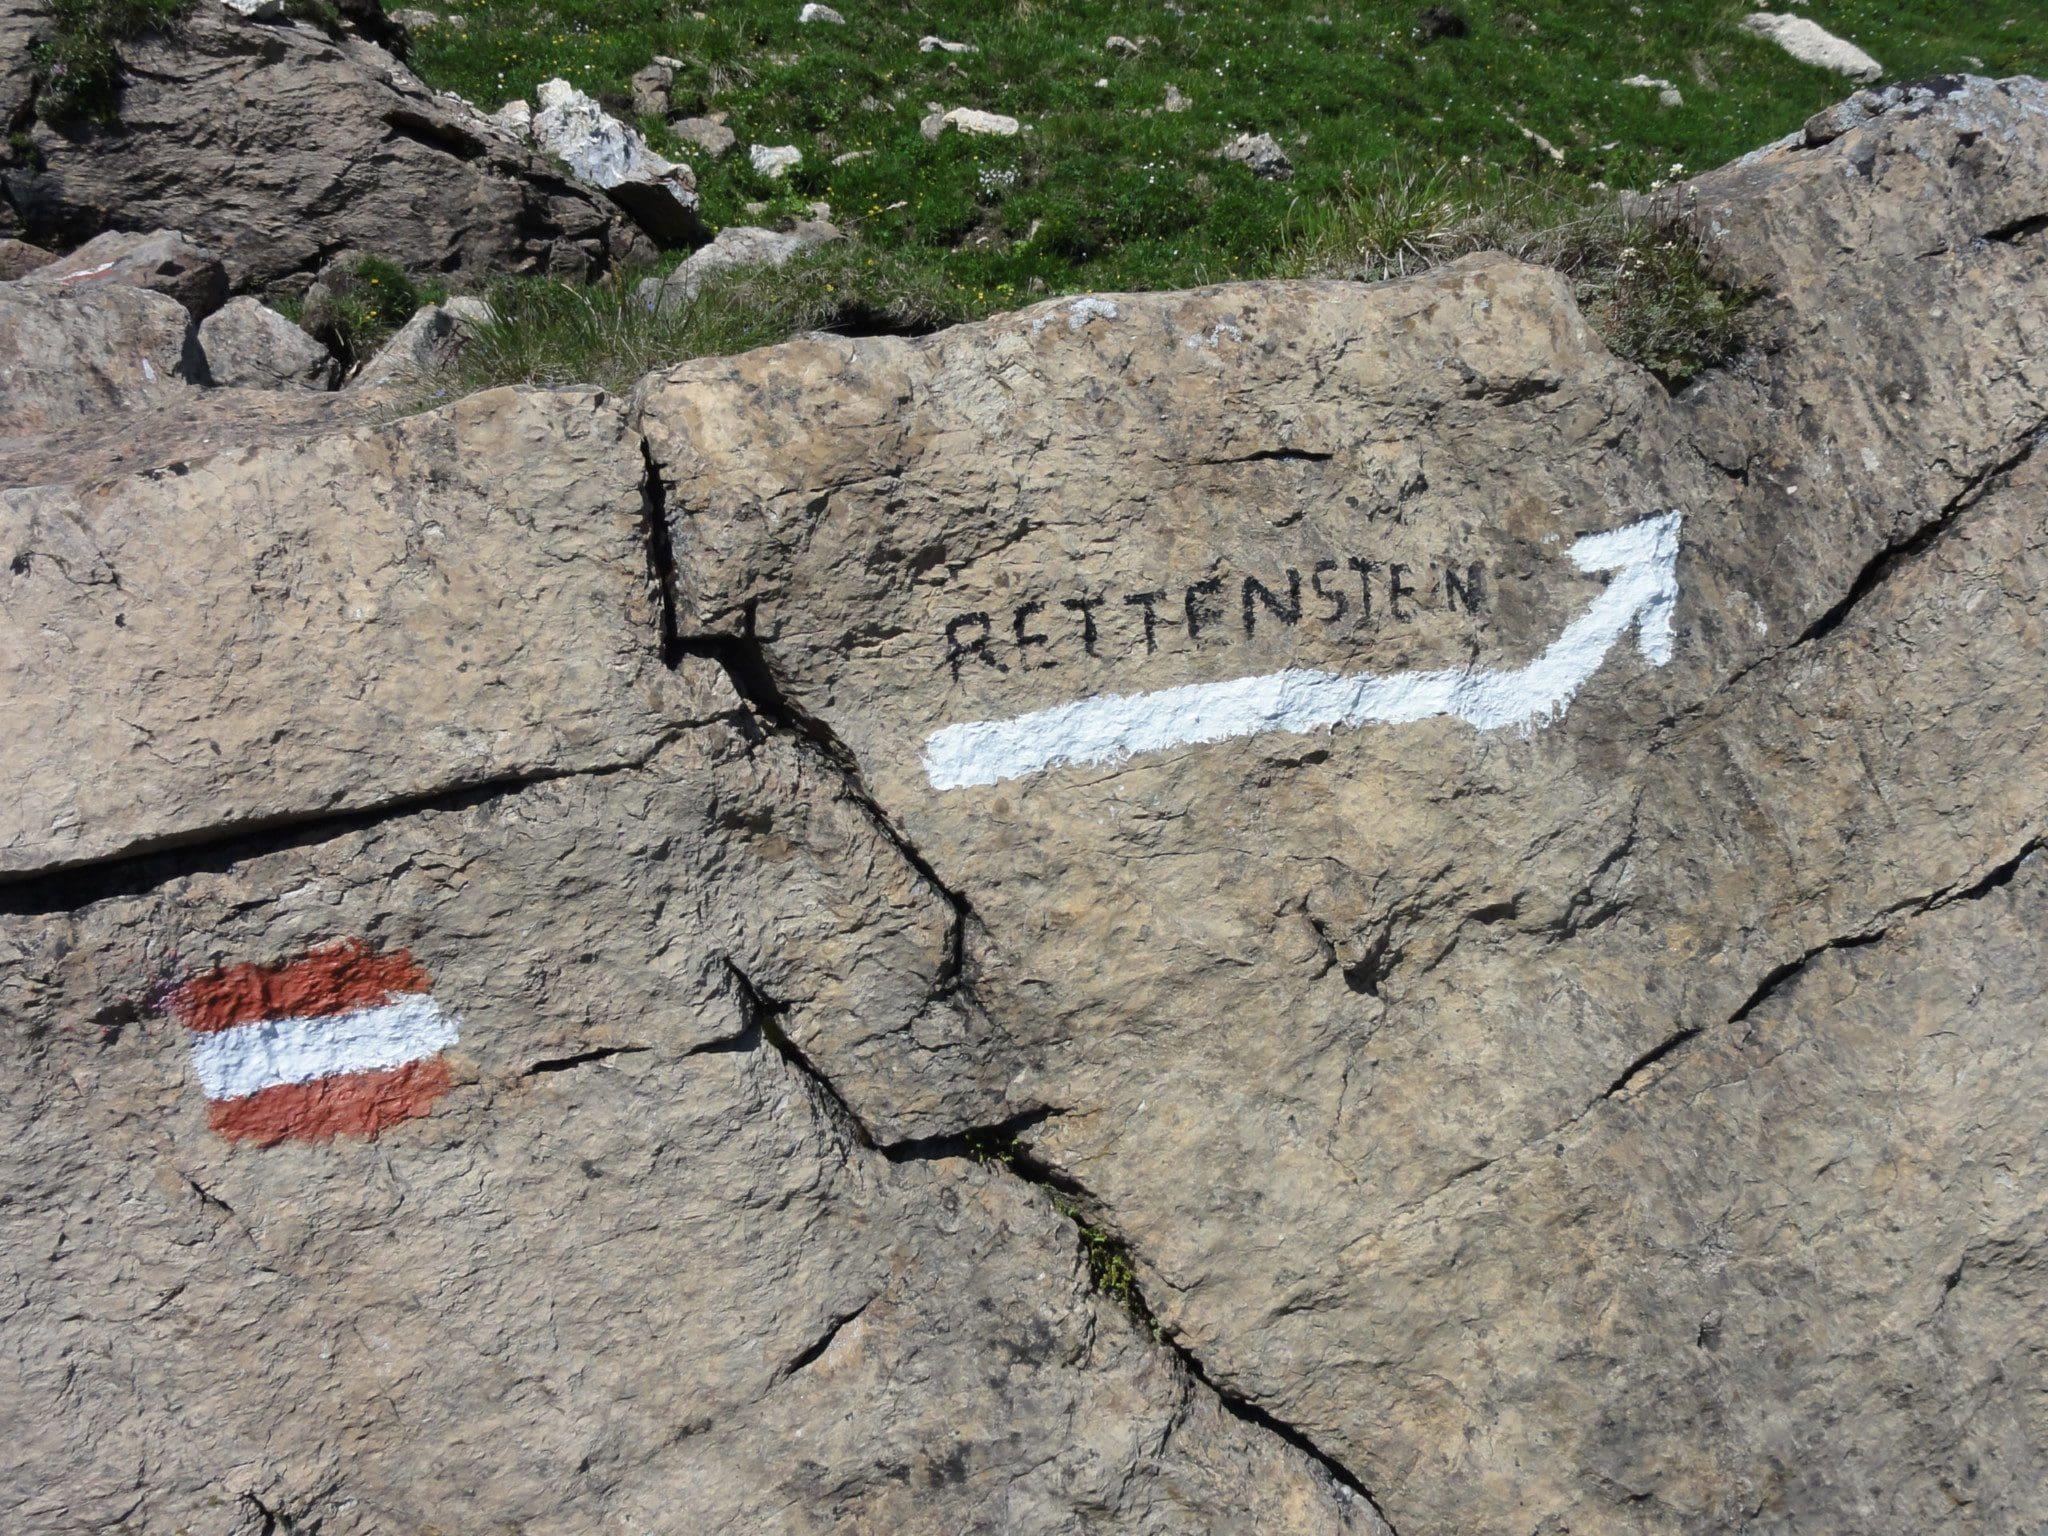 Grosser-Rettenstein_3